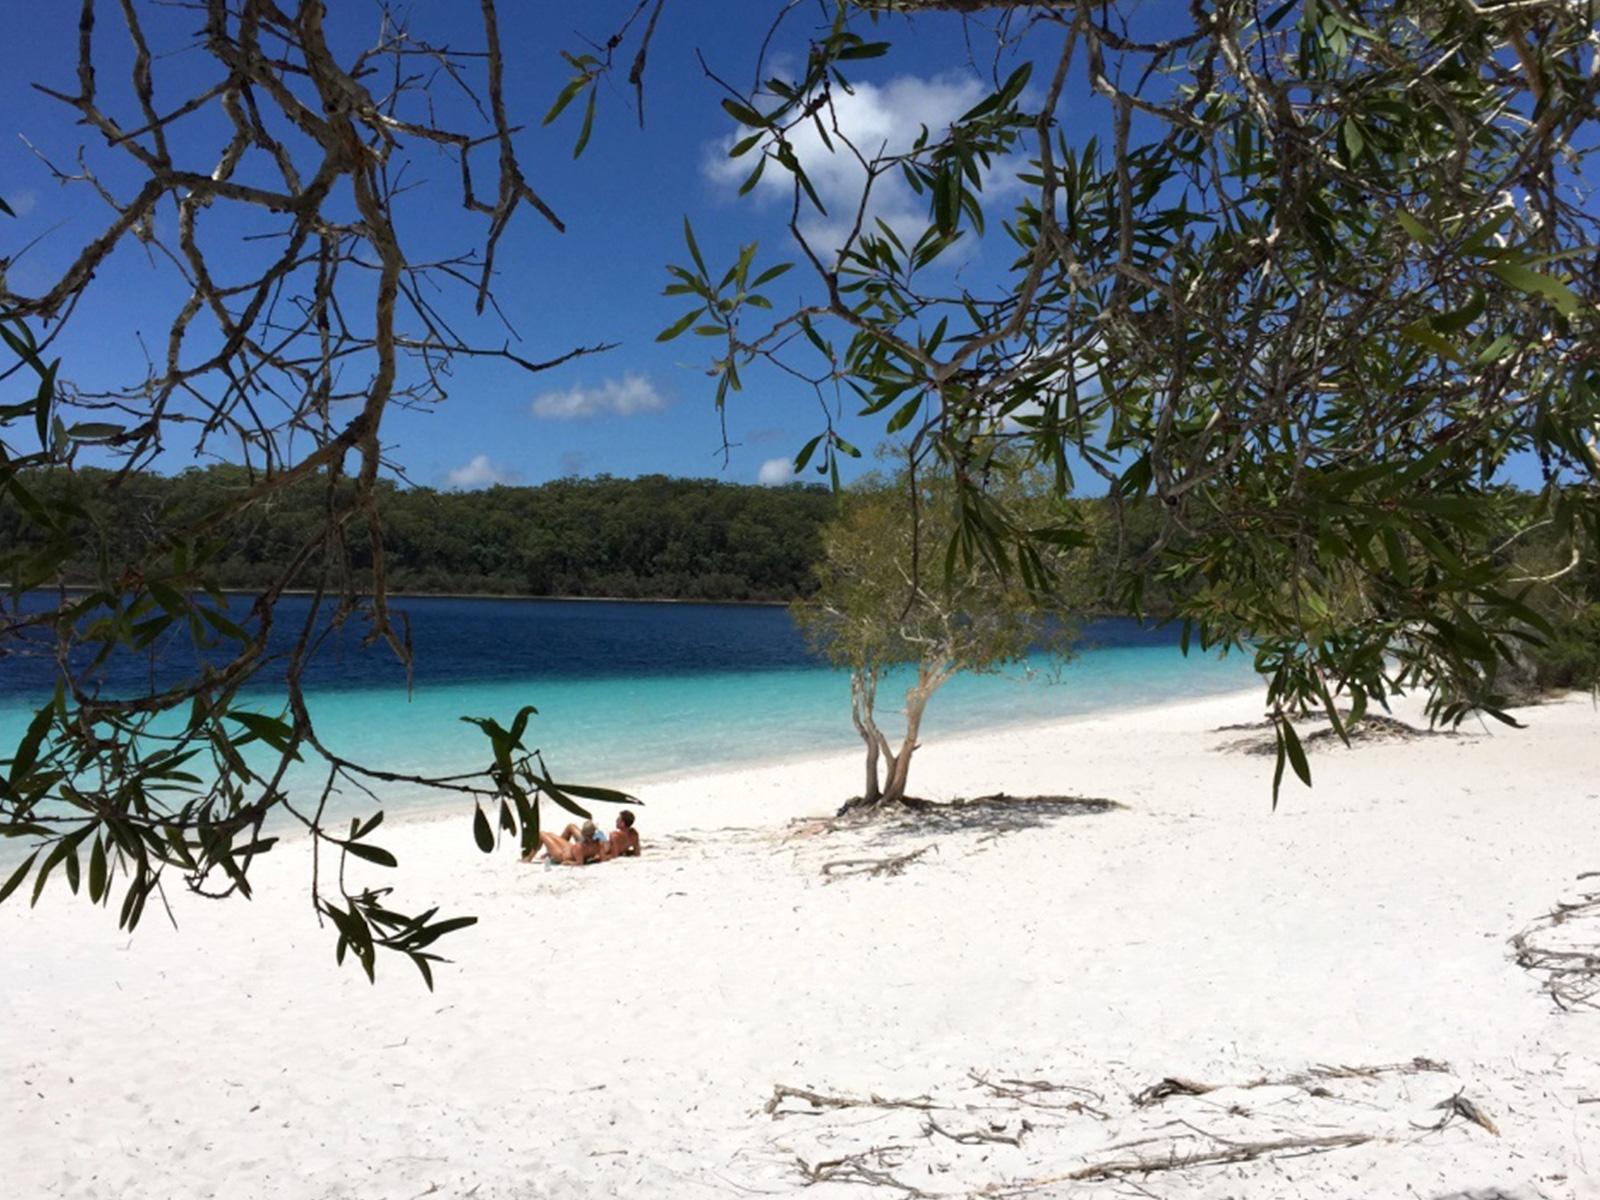 tourameo-reiseplanung-reiseziel-australien-fraser-island